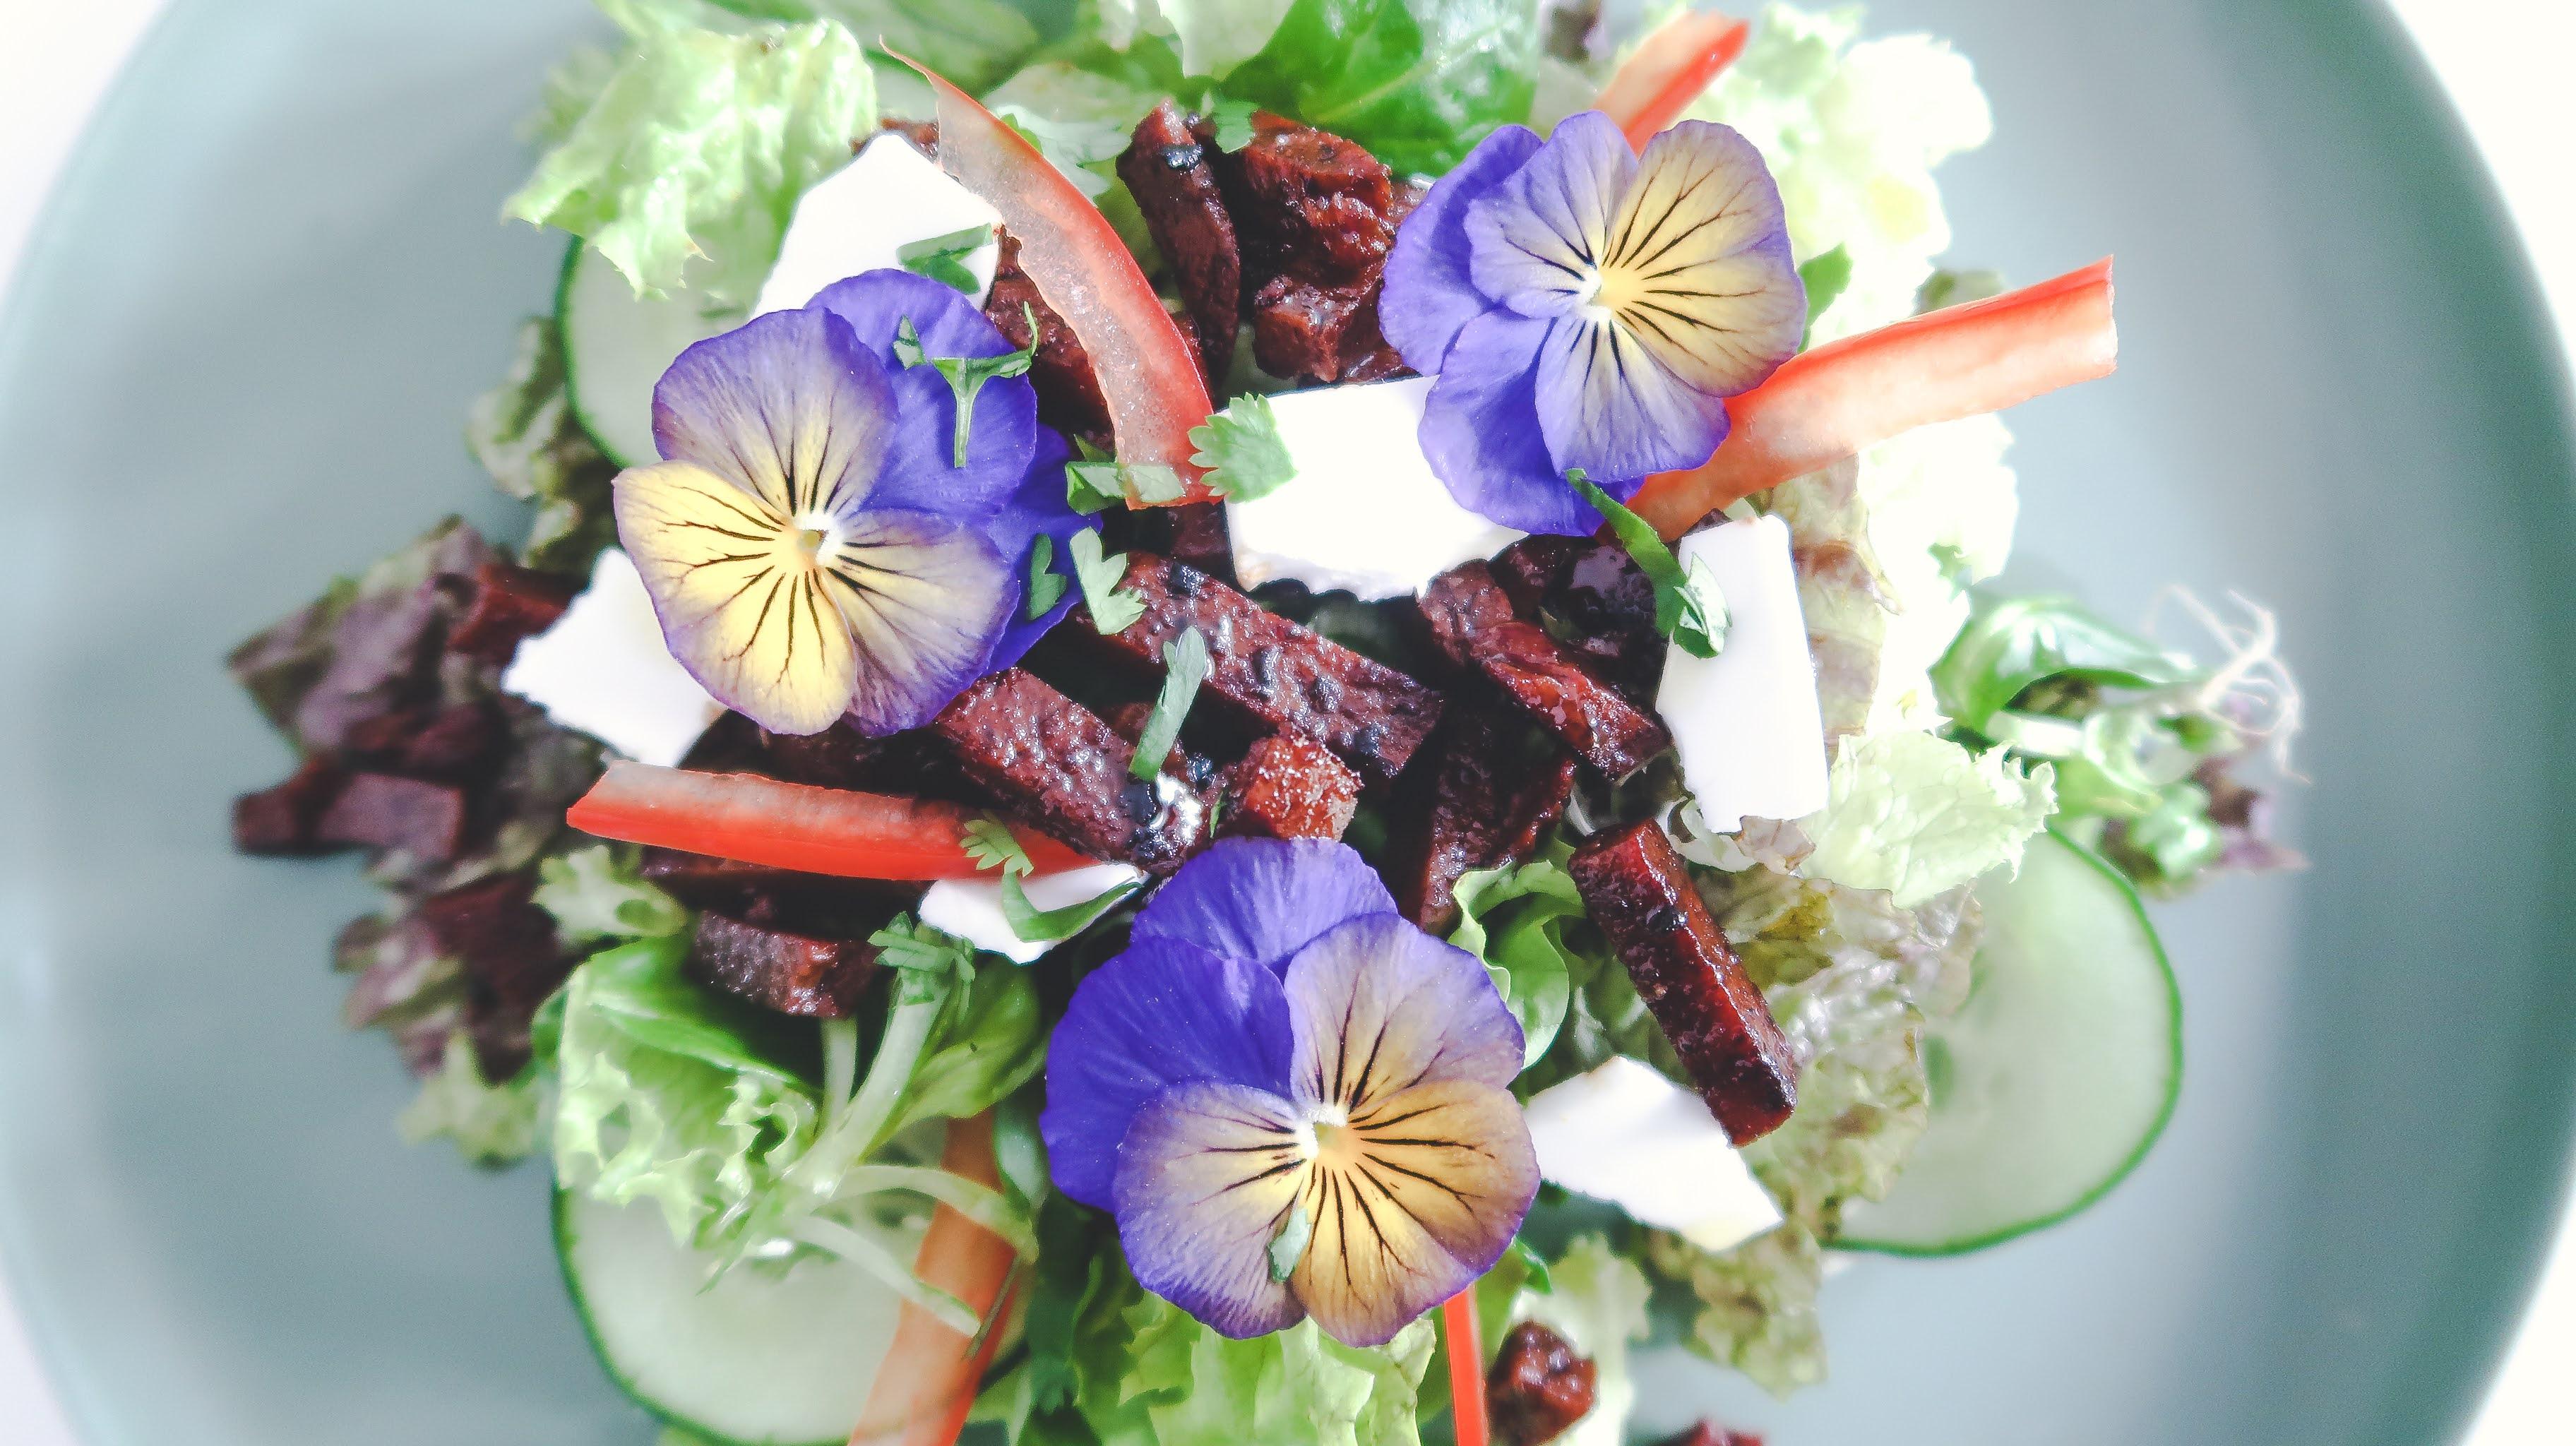 Salad with seitan 'bacon bits'